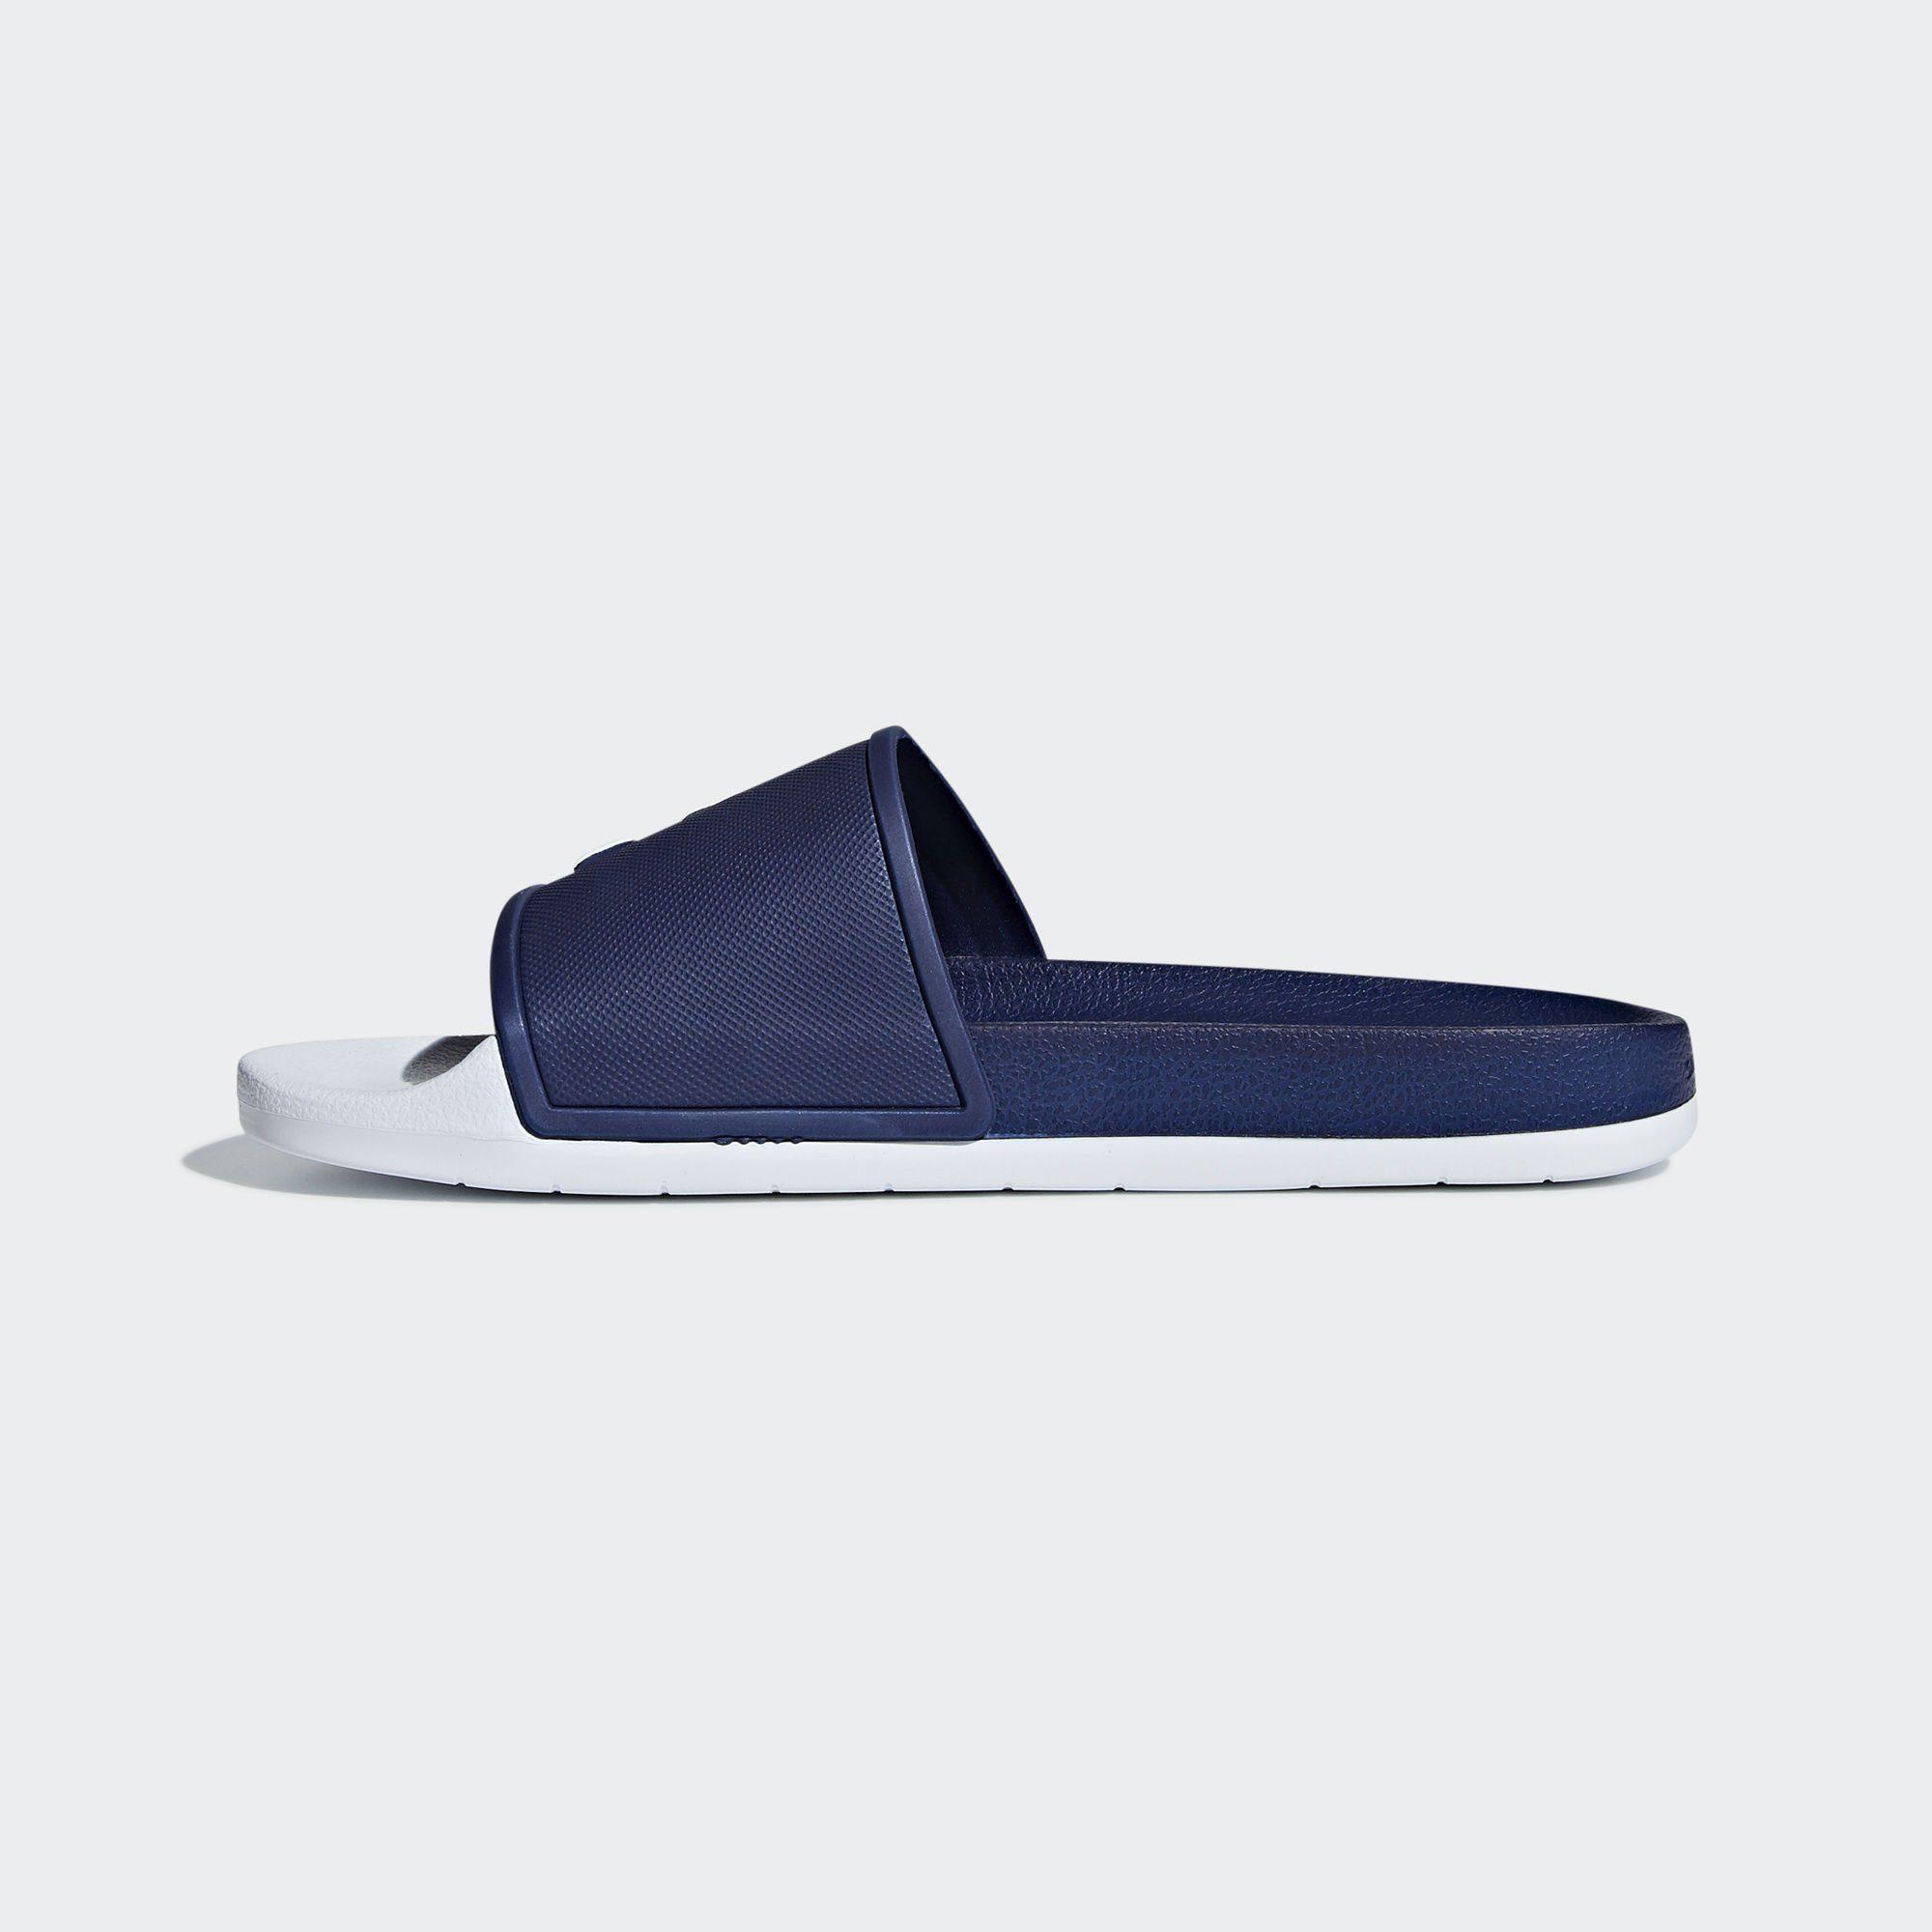 Adidas Kaufen Adilette Slipper Badesandale Online Artikel nr 5402380799 Blue Performance Tnd rwYxBArH